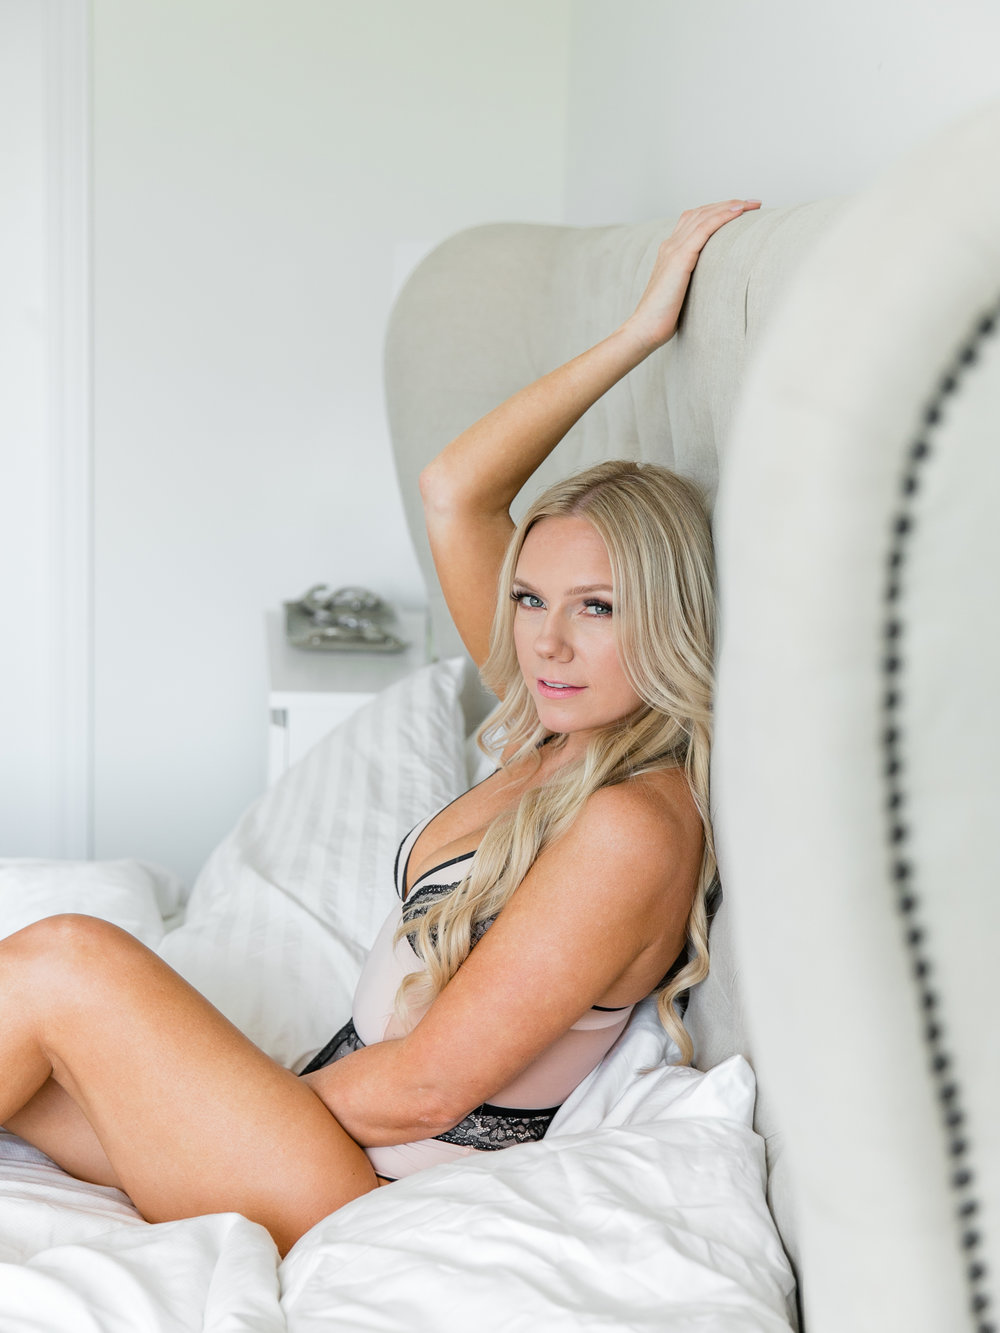 KelseyBoudoir_StephanieMasonPhotography-39.jpg